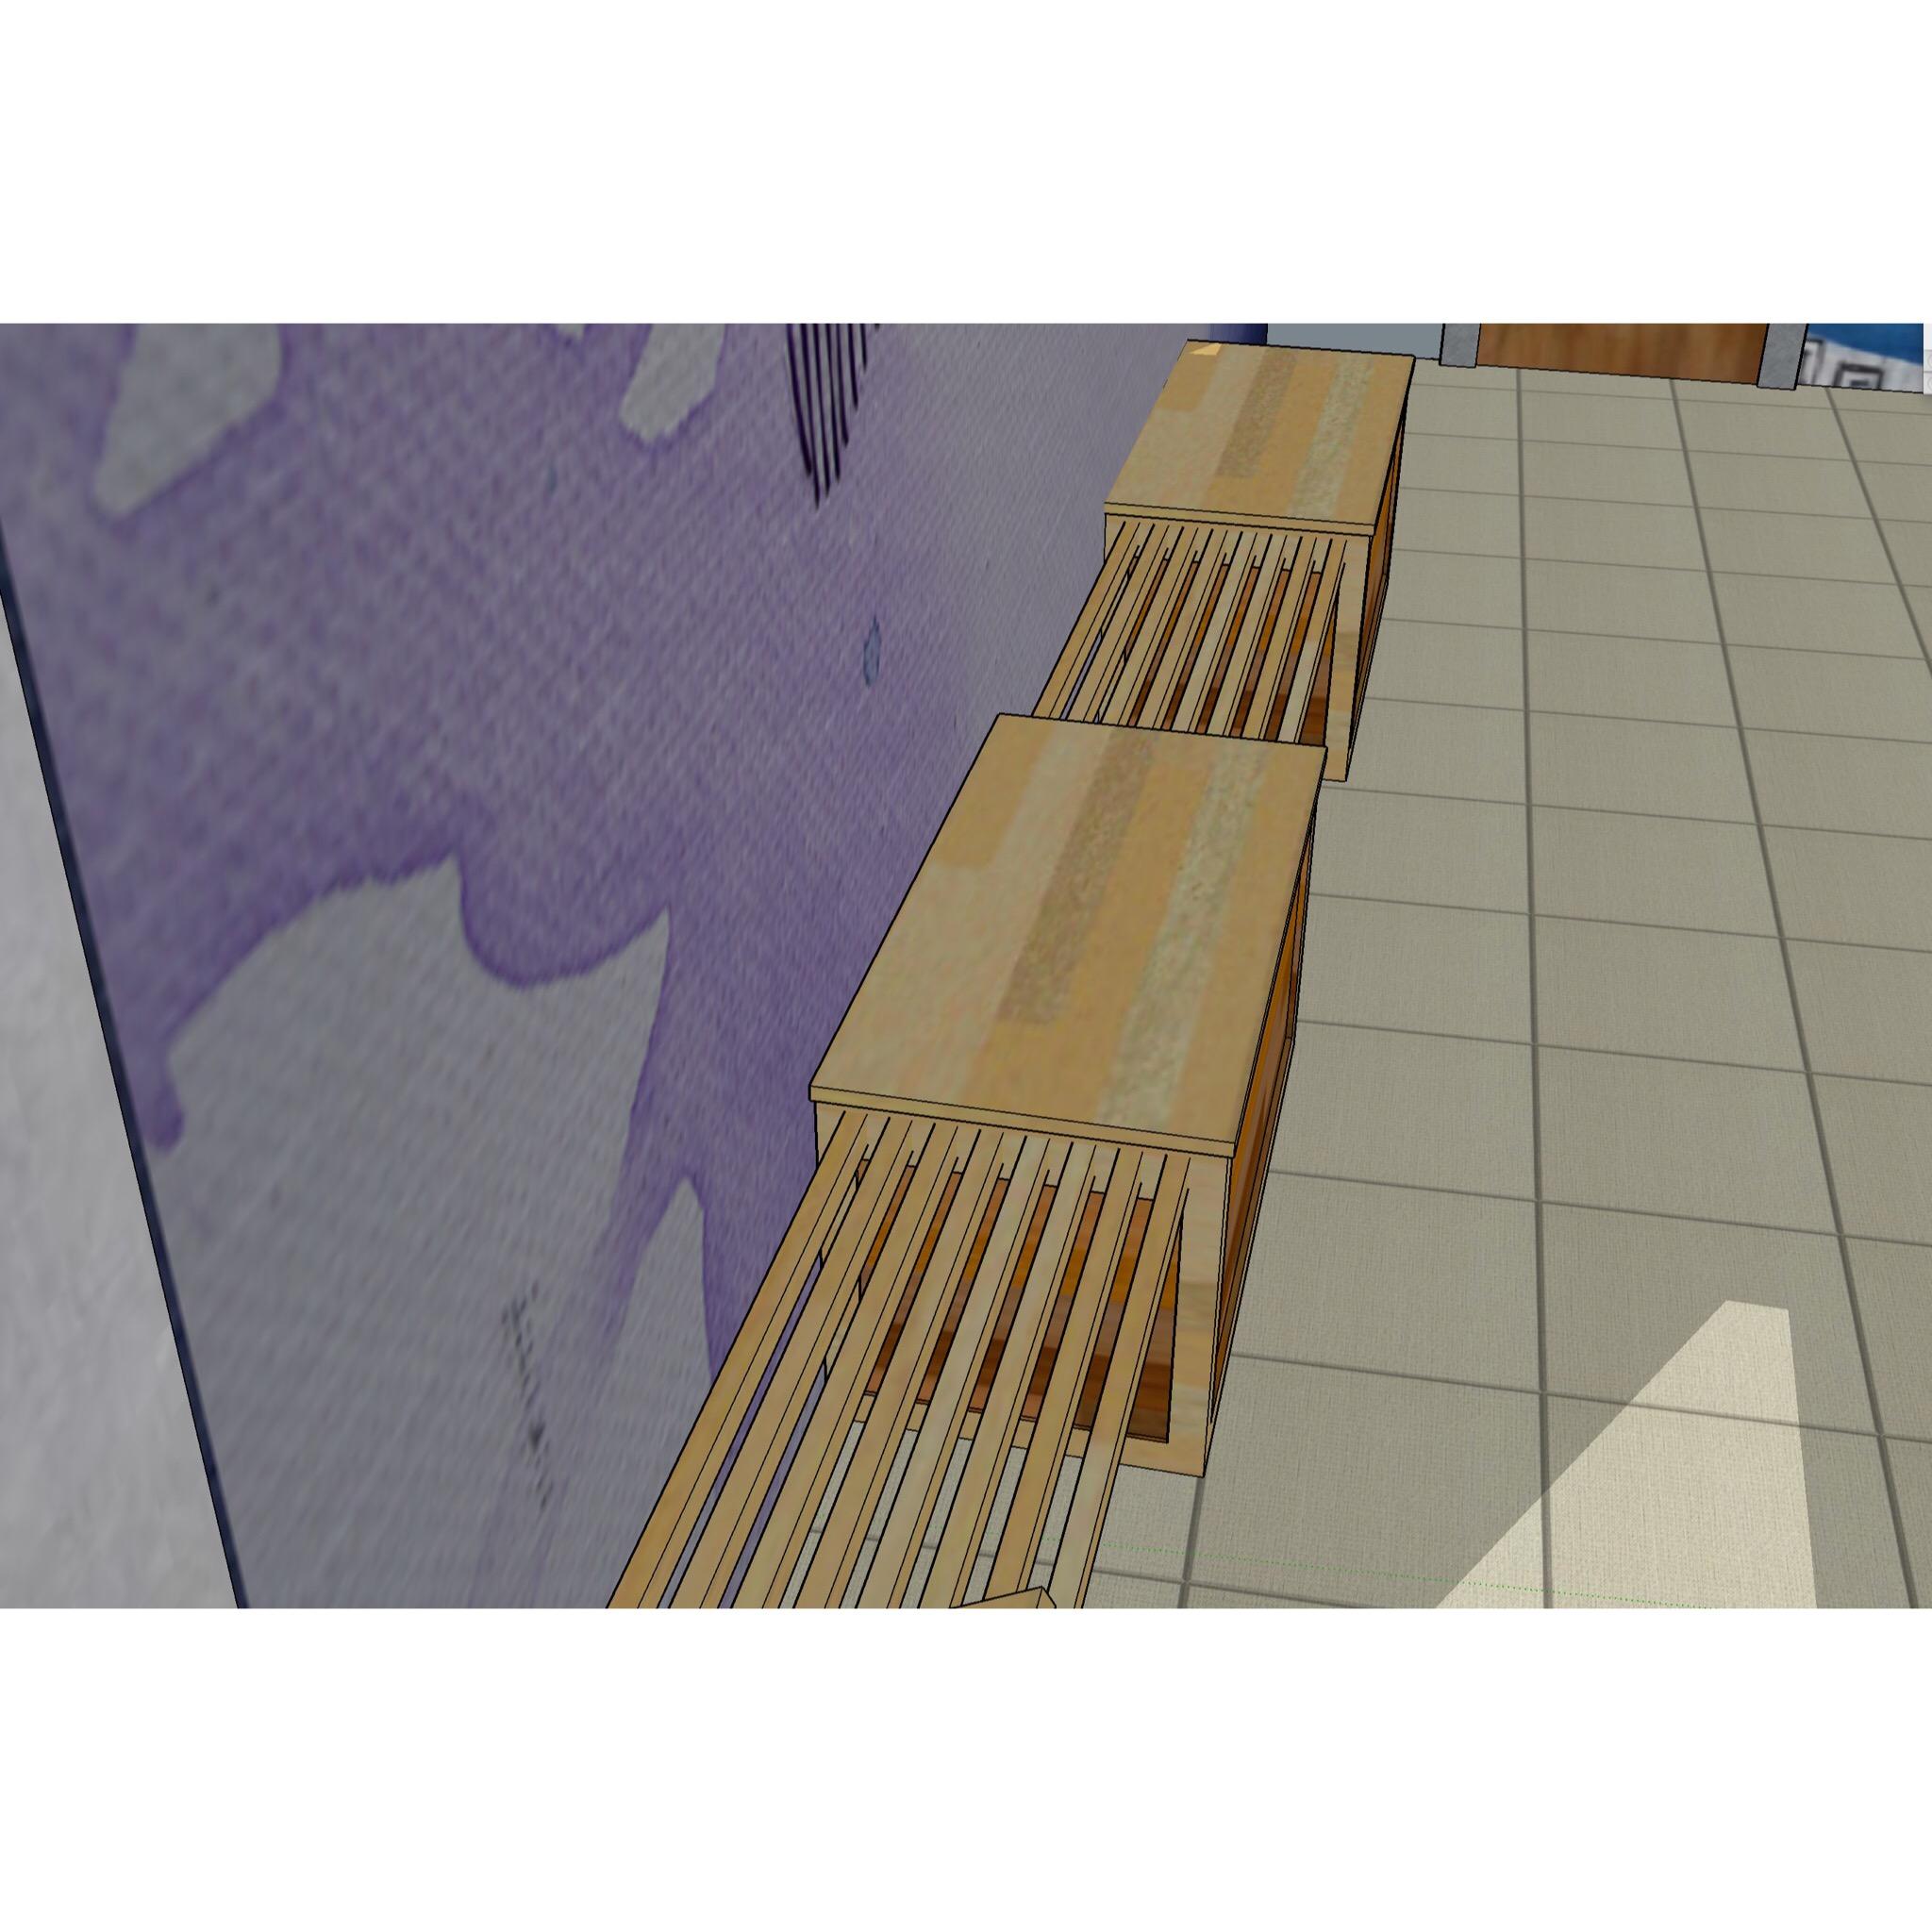 Still shot of digital 3D hallway design mock up